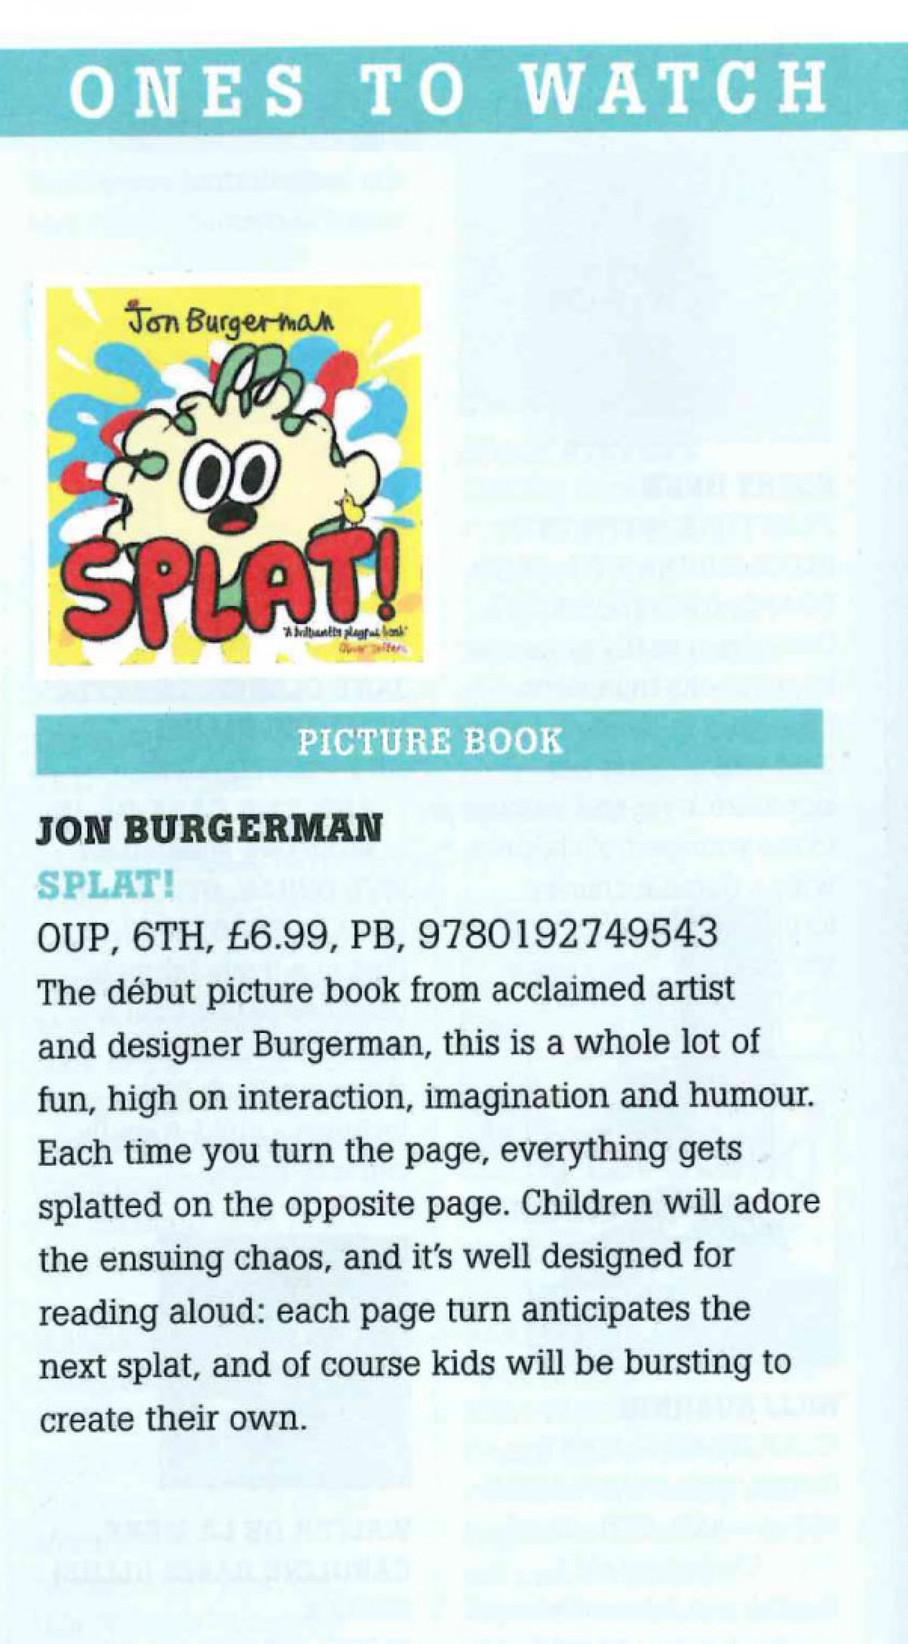 press-splat-in-bookseller_d56e88be2b8cbf